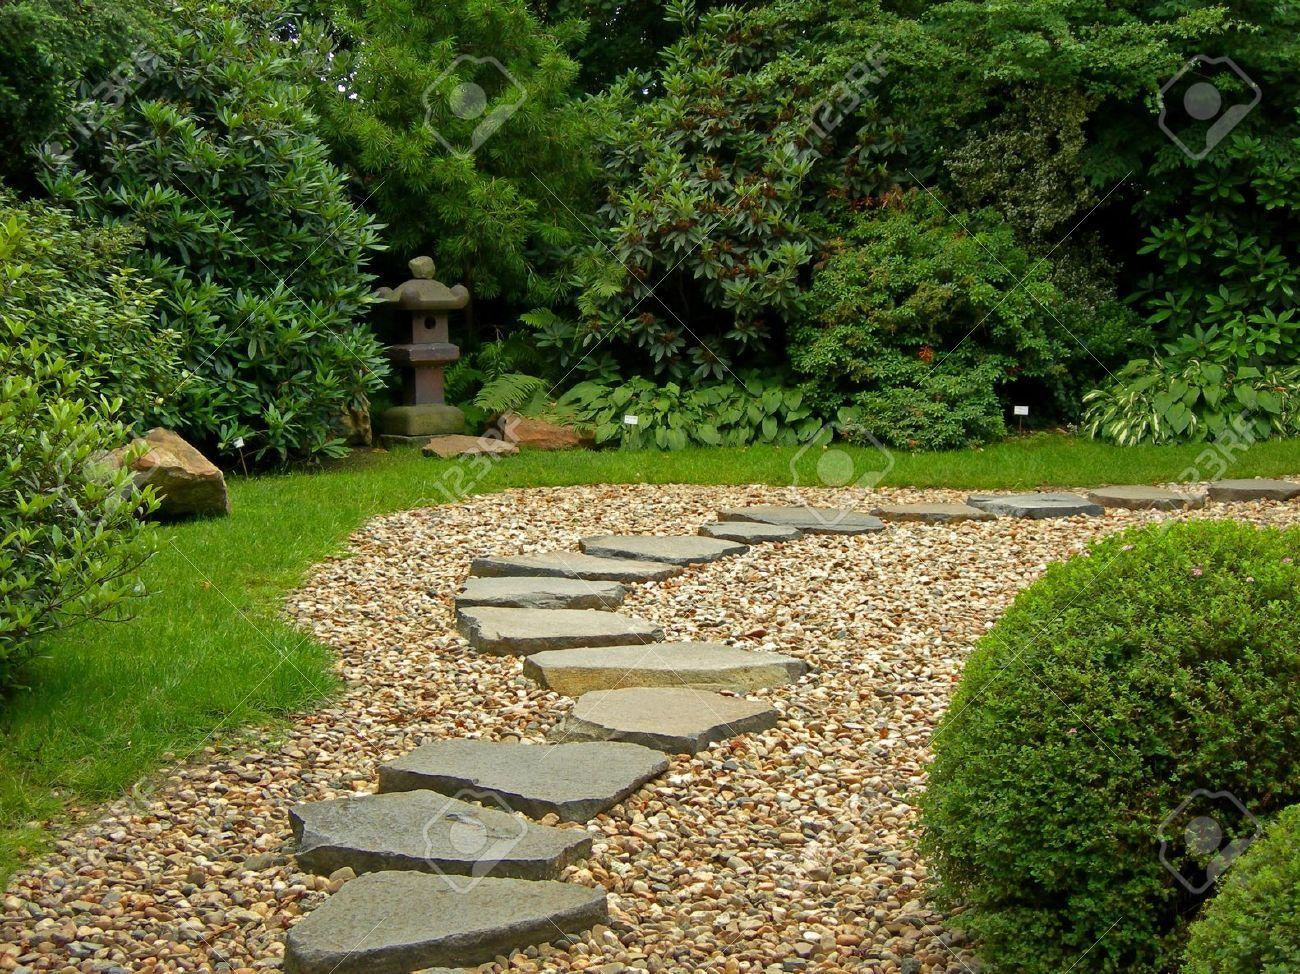 Zen path in a japanese botanical garden in prague stock for Japanese garden path design